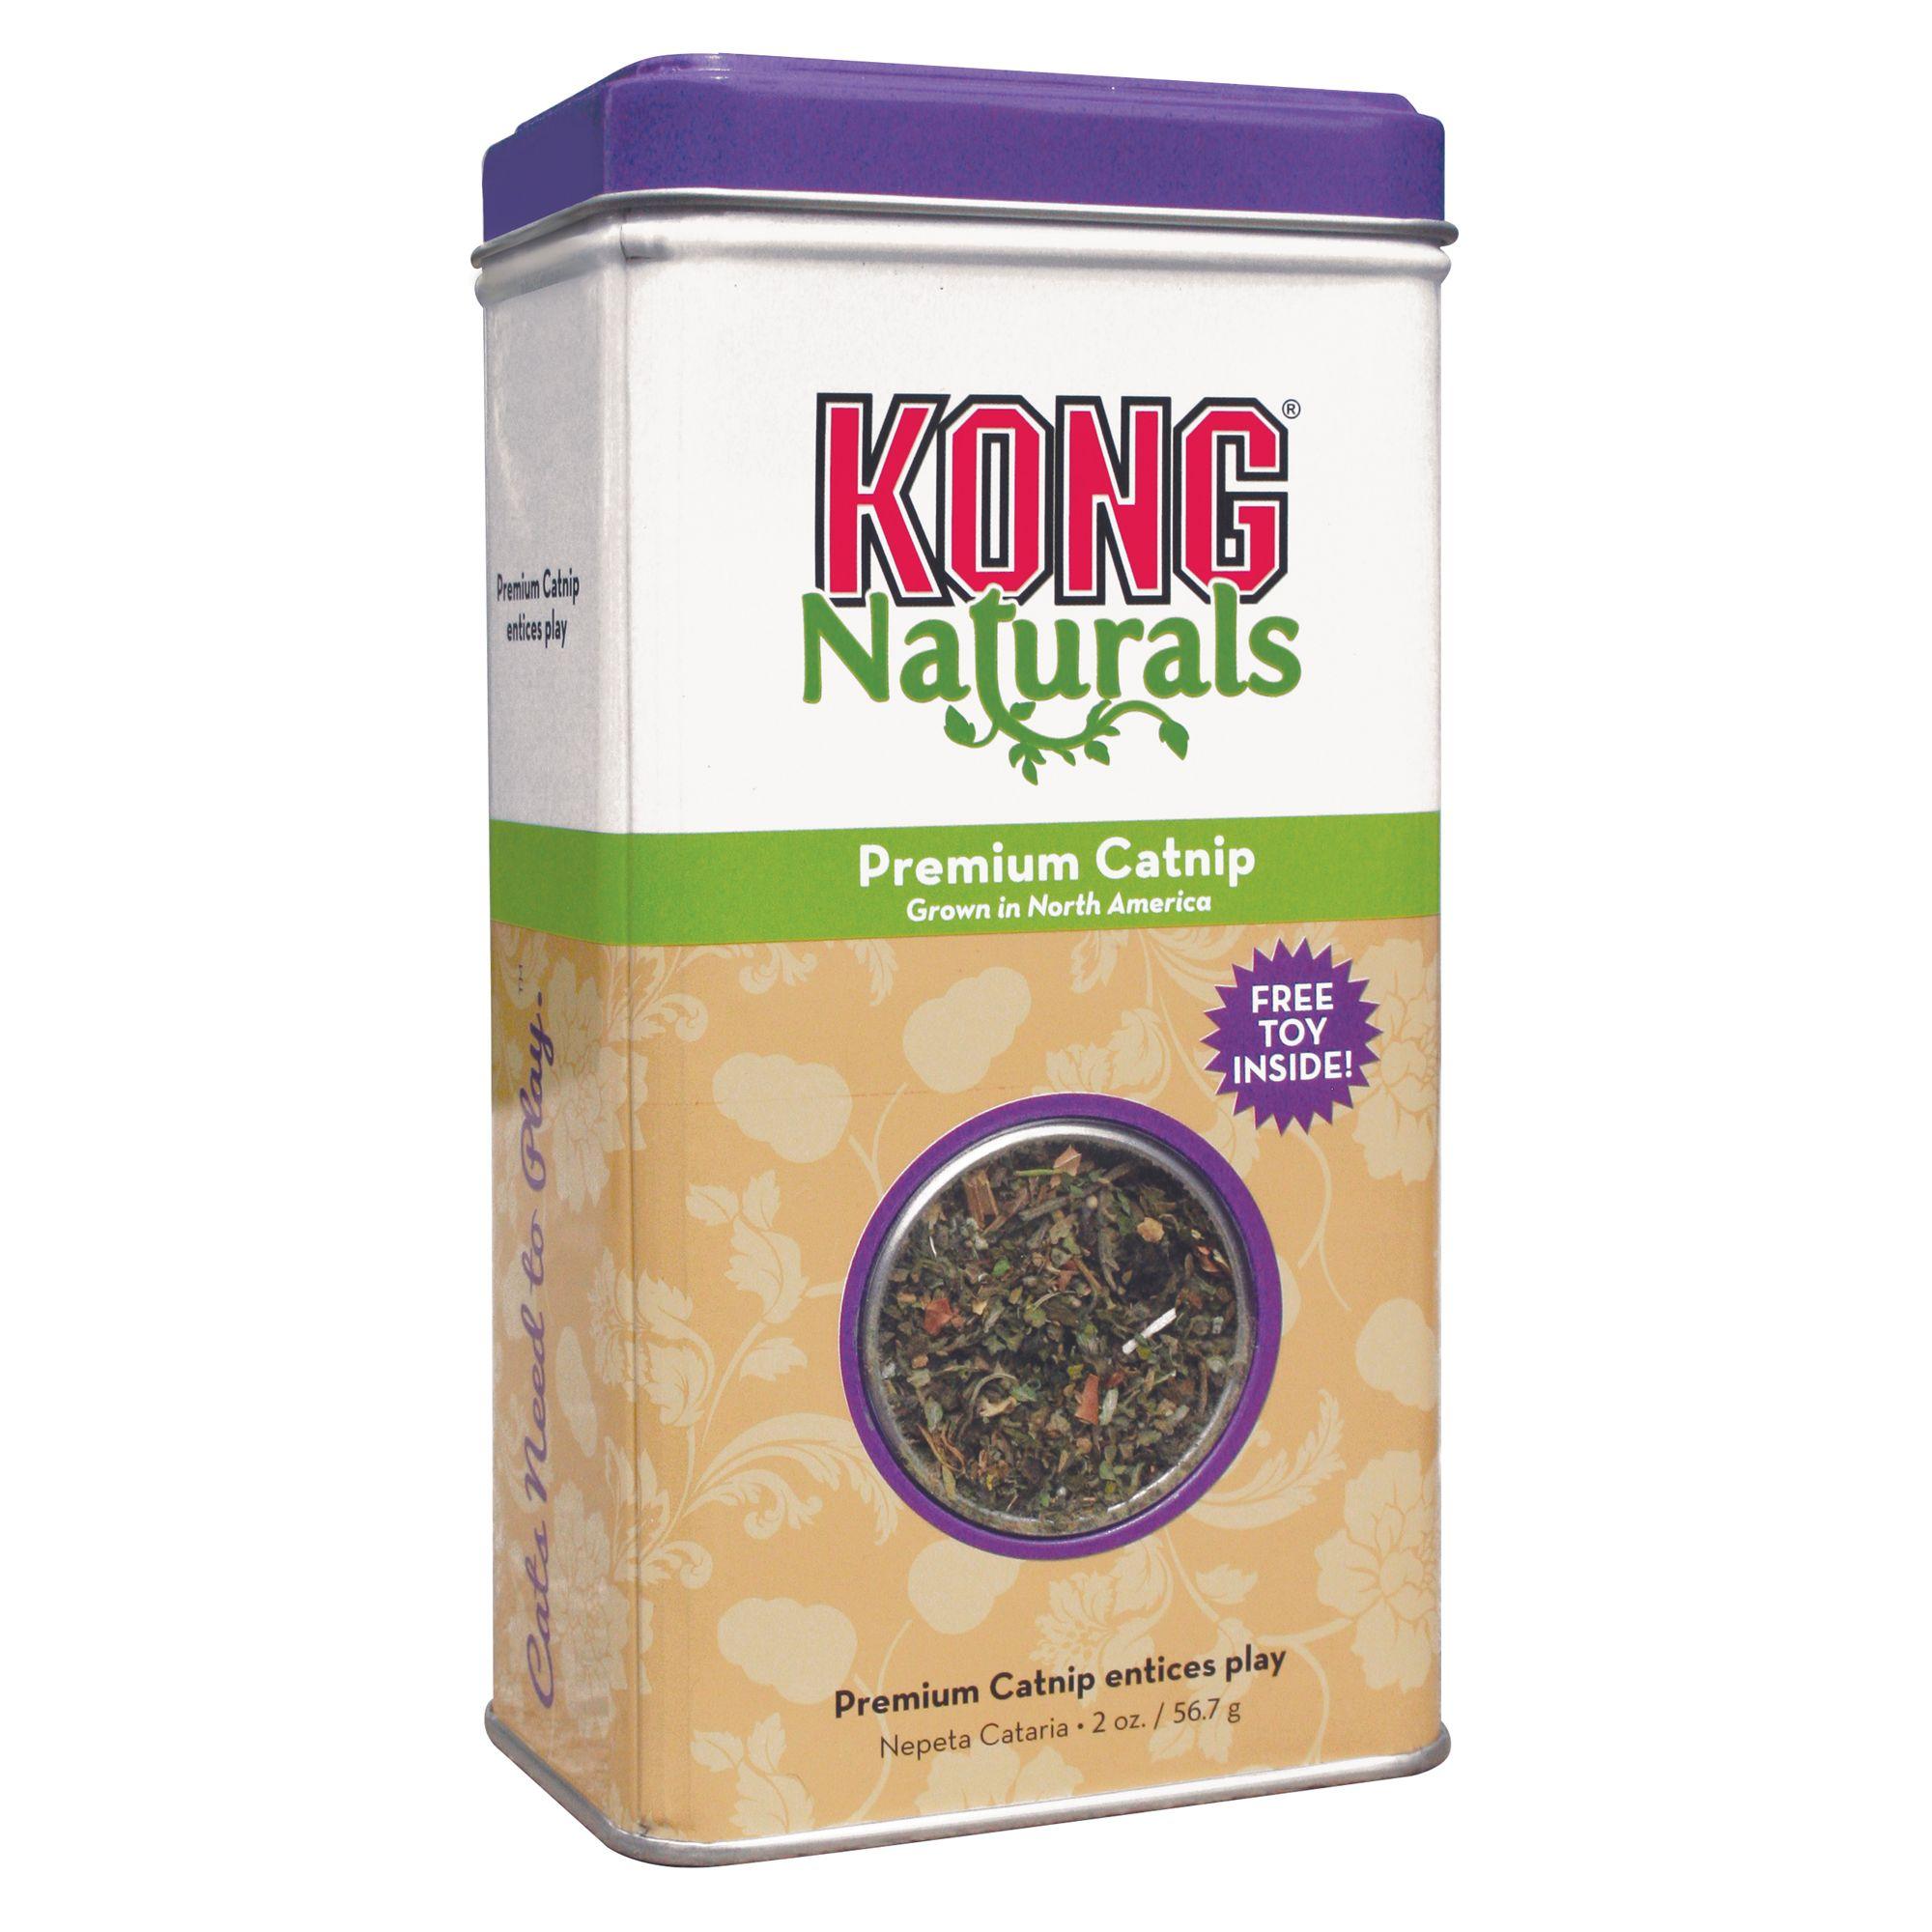 Kong® Premium Catnip size: 2 Oz 5159769